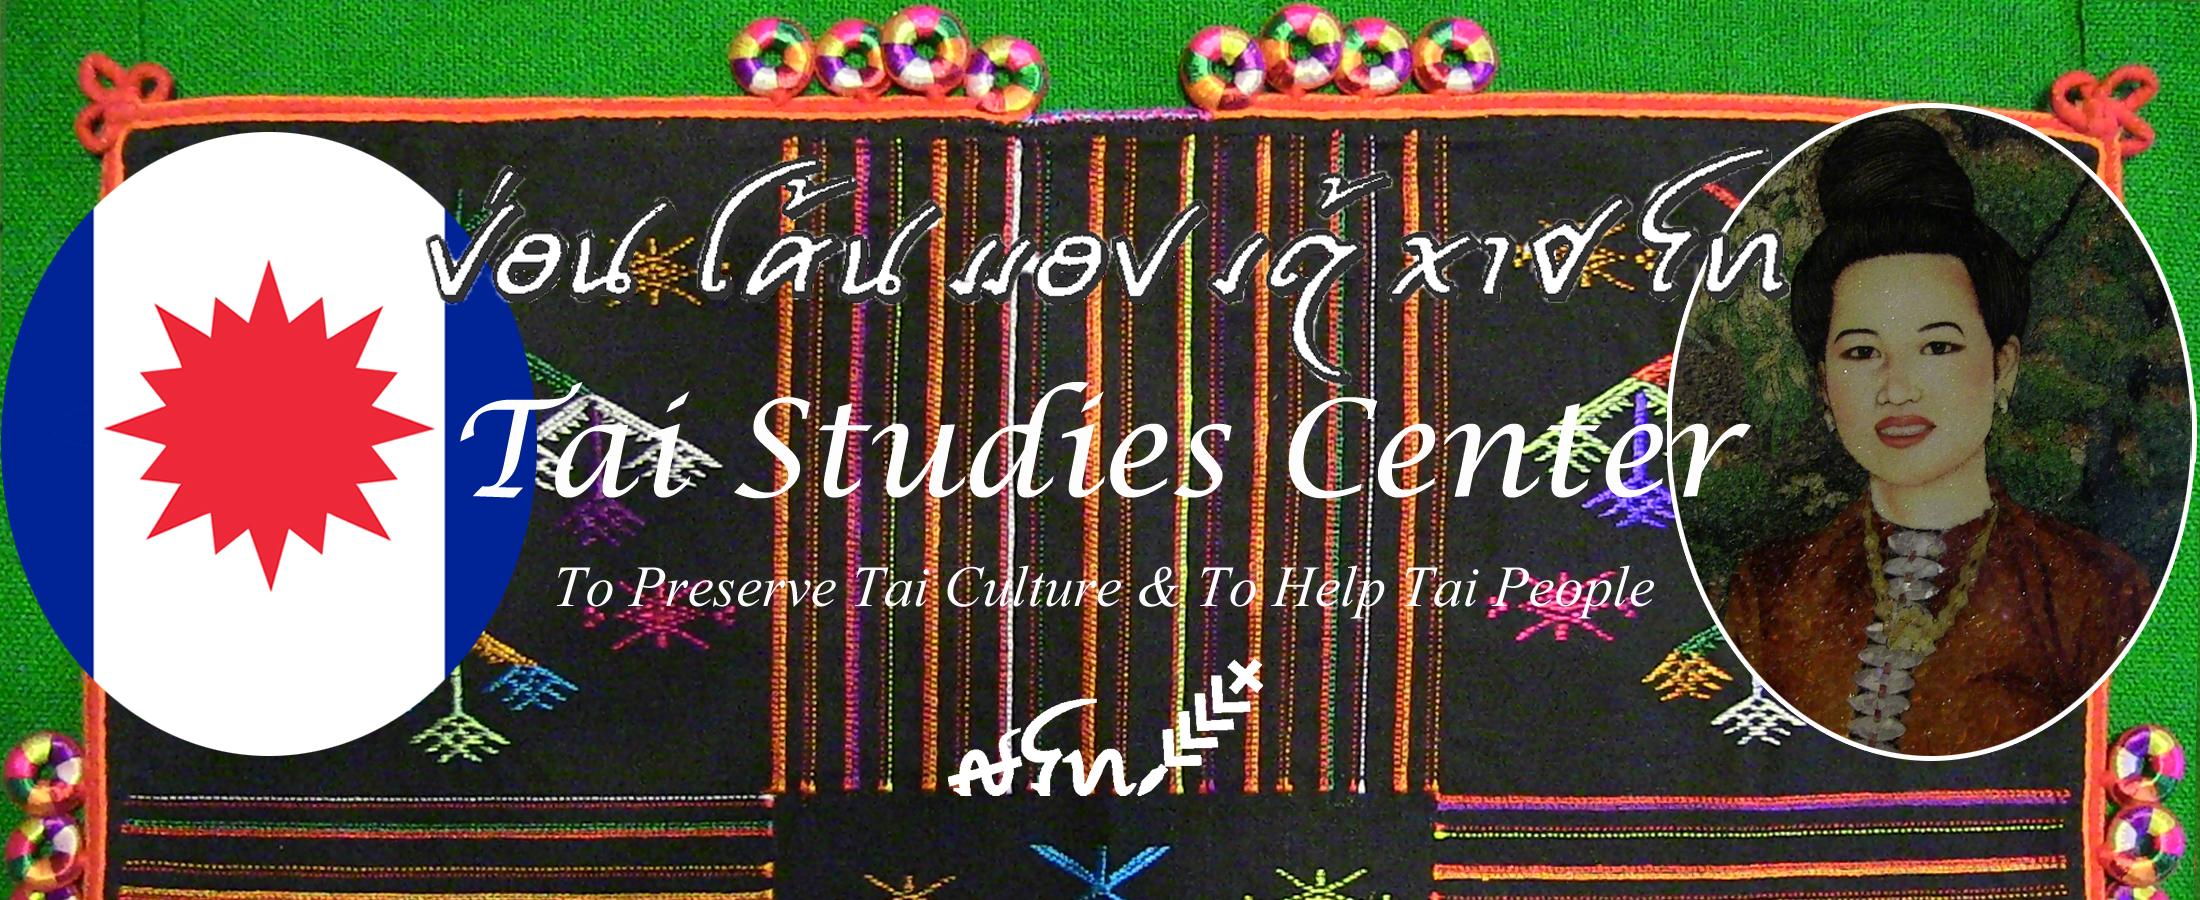 Tai Studies Center